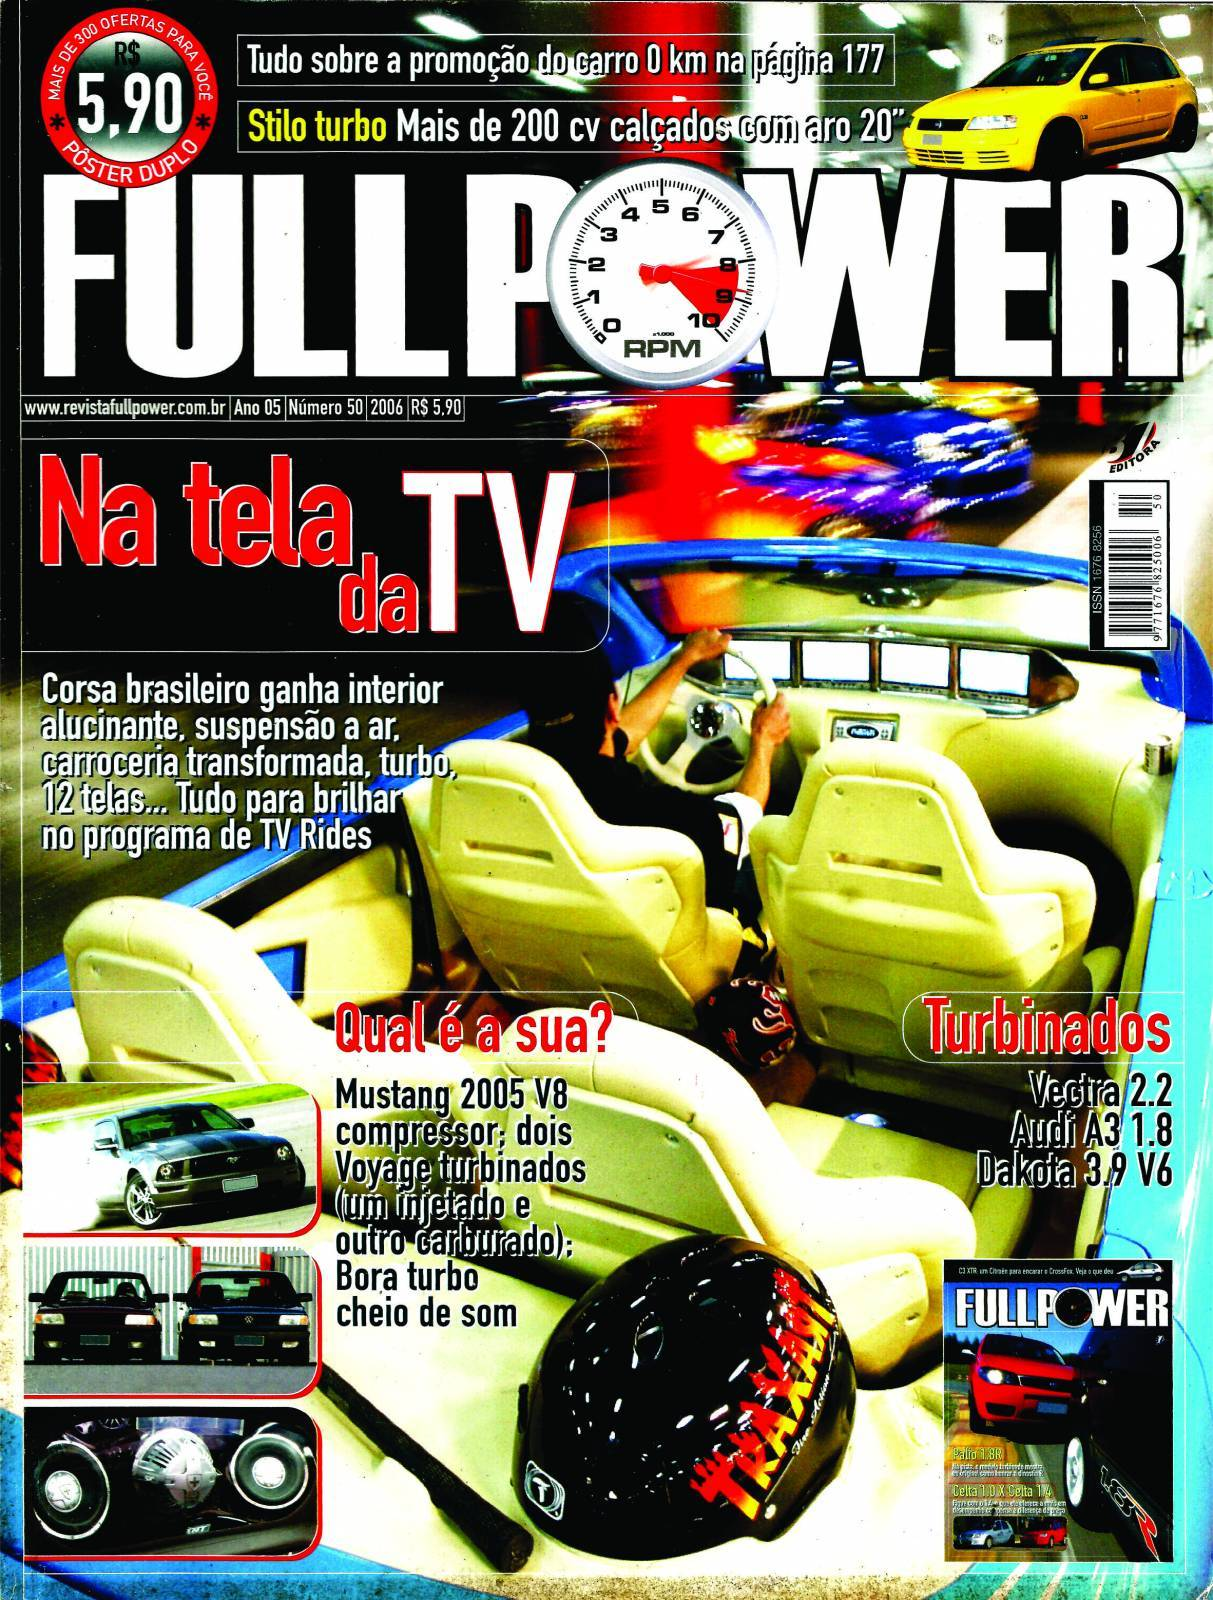 REVISTA FULLPOWER No. 50 ANO 2006 - Loja FullPower